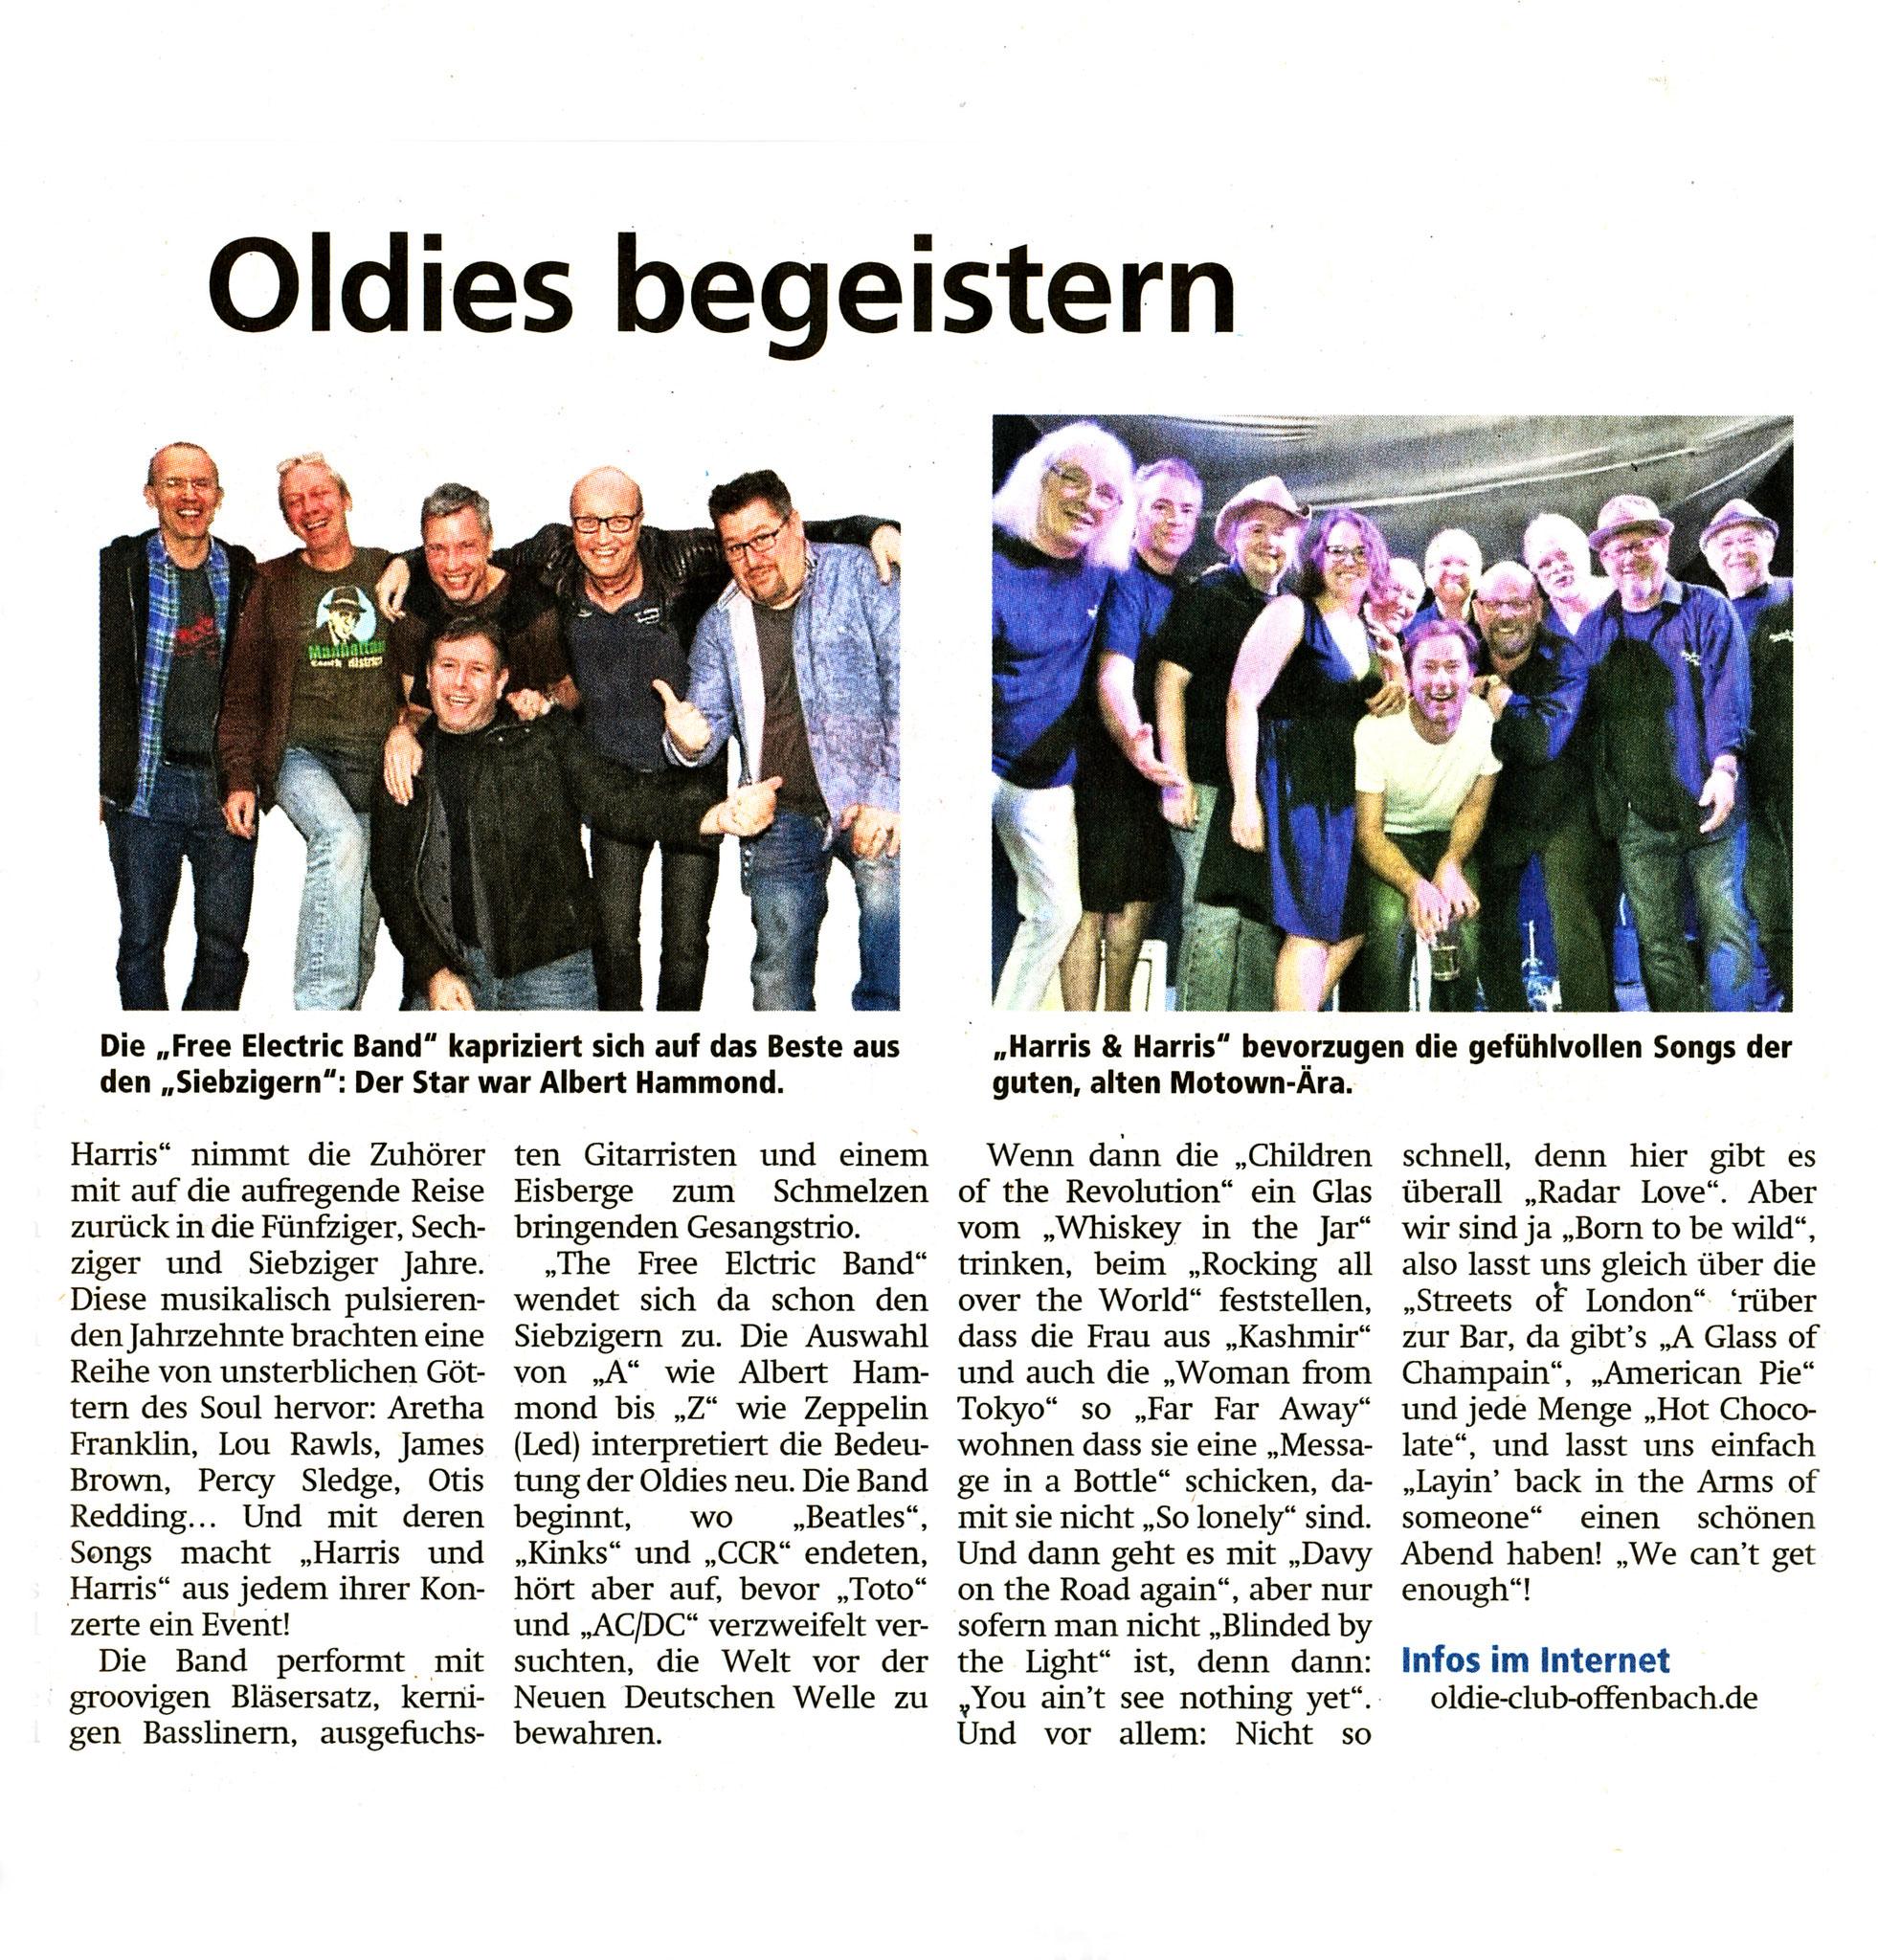 Offenbach Post, 14. März 2019